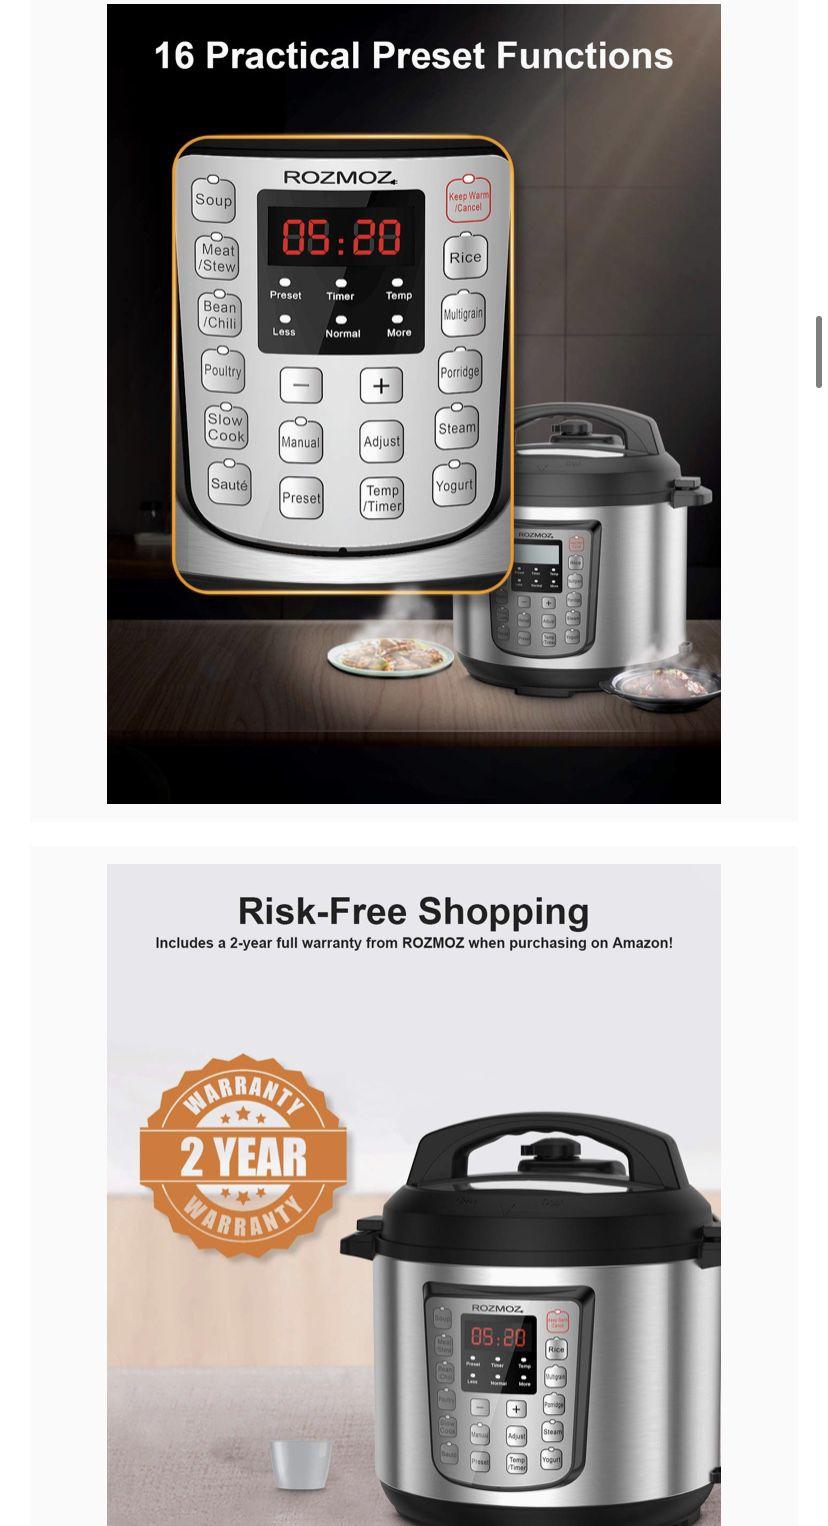 12-in-1 Electric Pressure Cooker Instant Stainless Steel Pot, Slow Cooker, Steamer, Saute, Yogurt Maker, Egg Cook, Sterilizer, Warmer, Rice Cooker wi